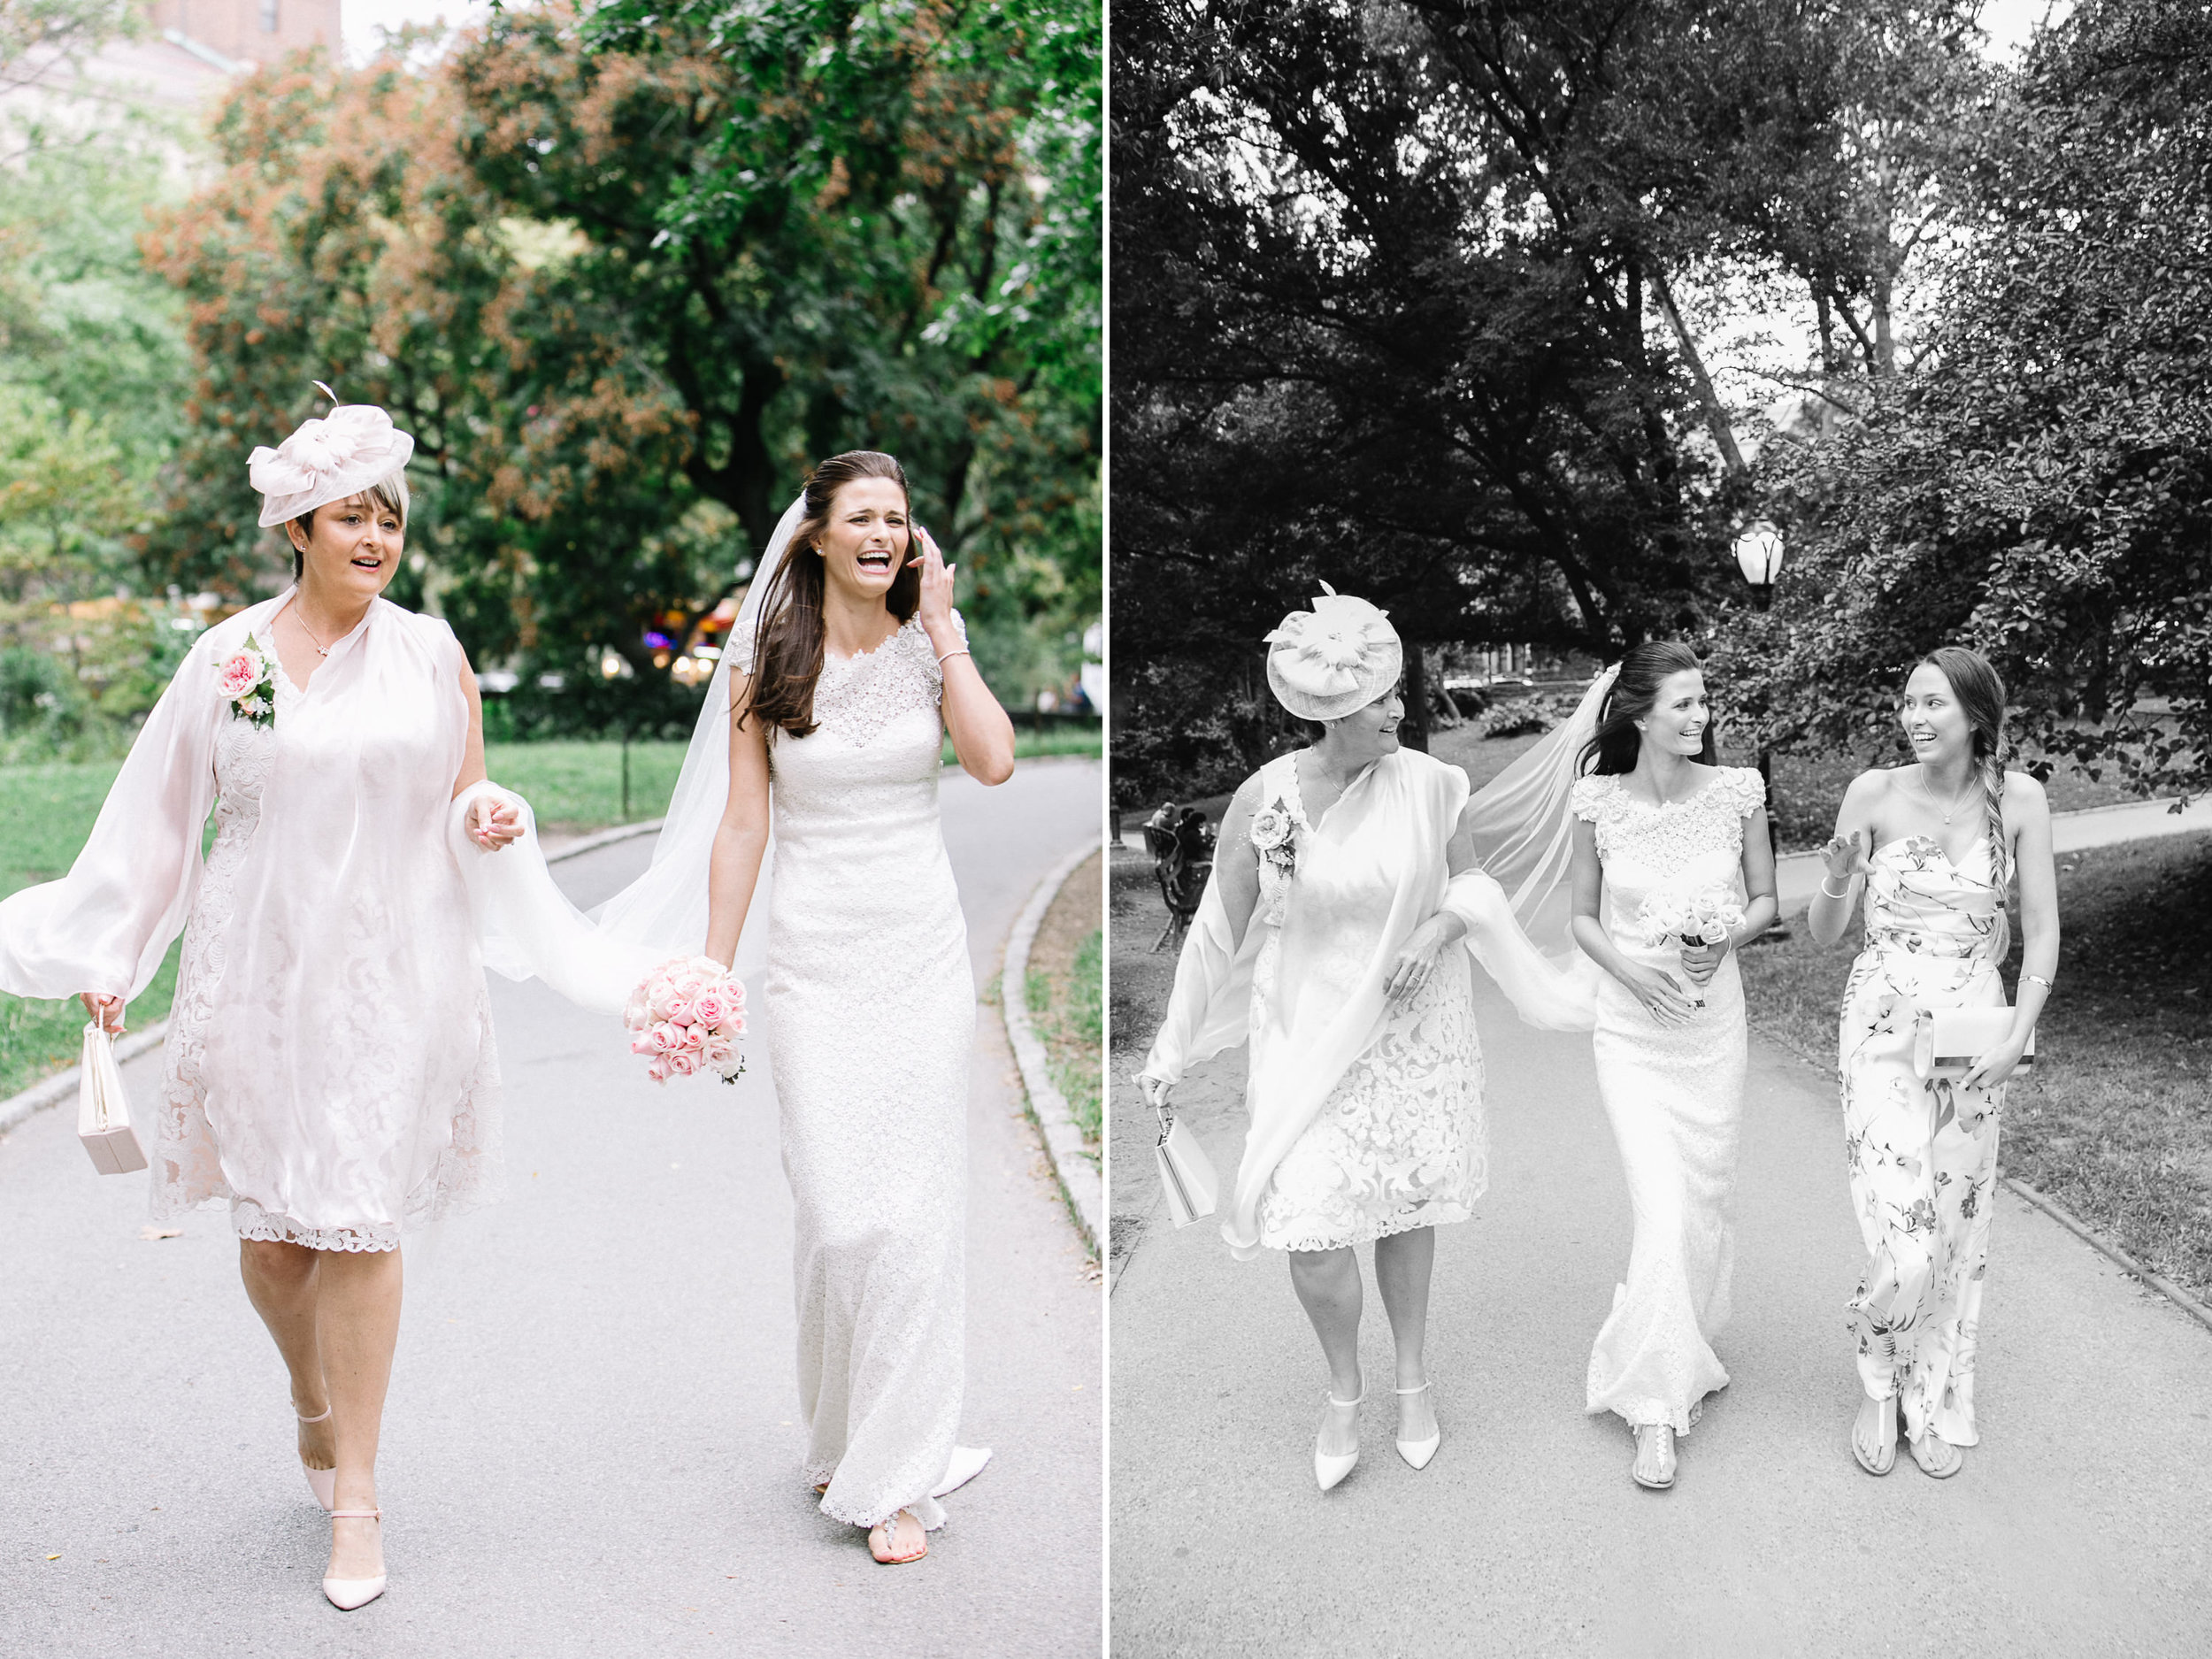 Shakespeare-garden-central-park-intimate-wedding-3-.jpg